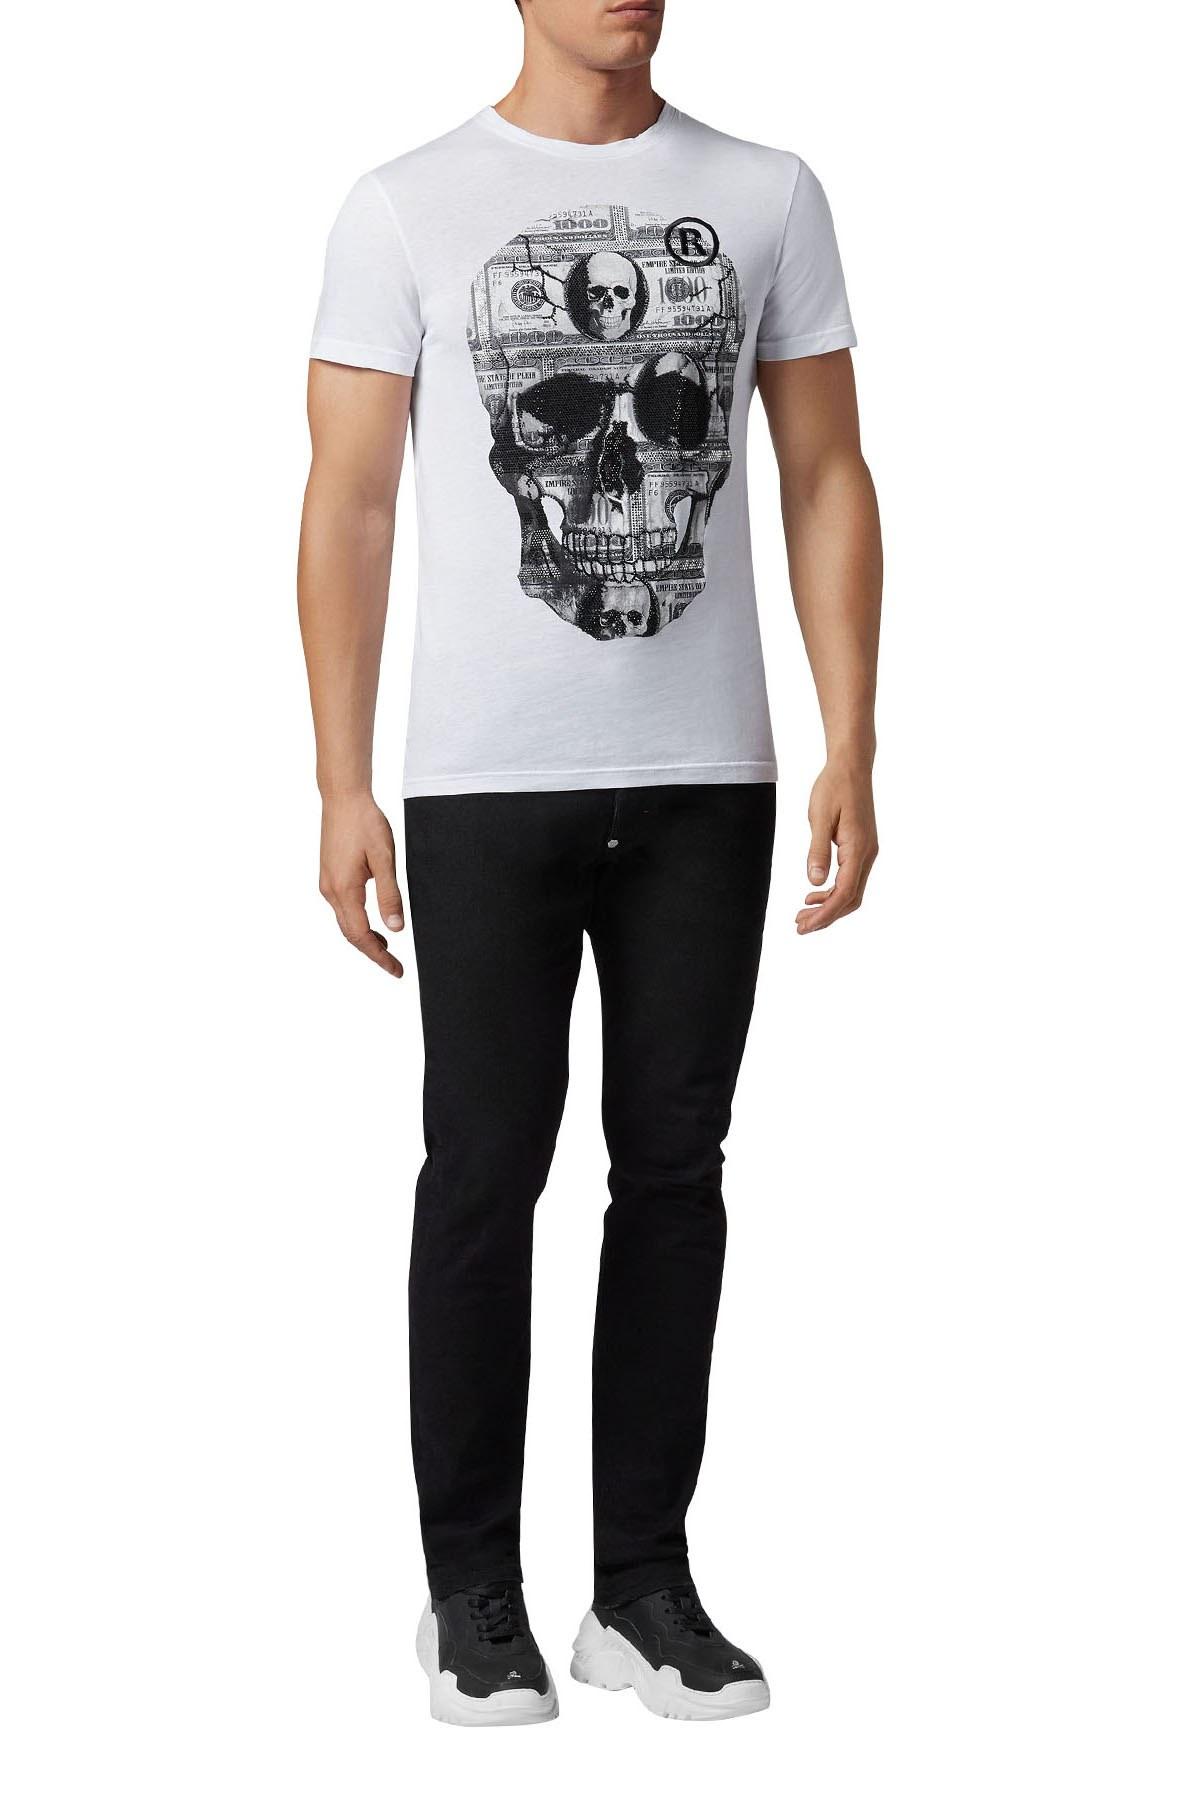 Philipp Plein Erkek T Shirt S19C MTK3000 PJY002N 01 BEYAZ